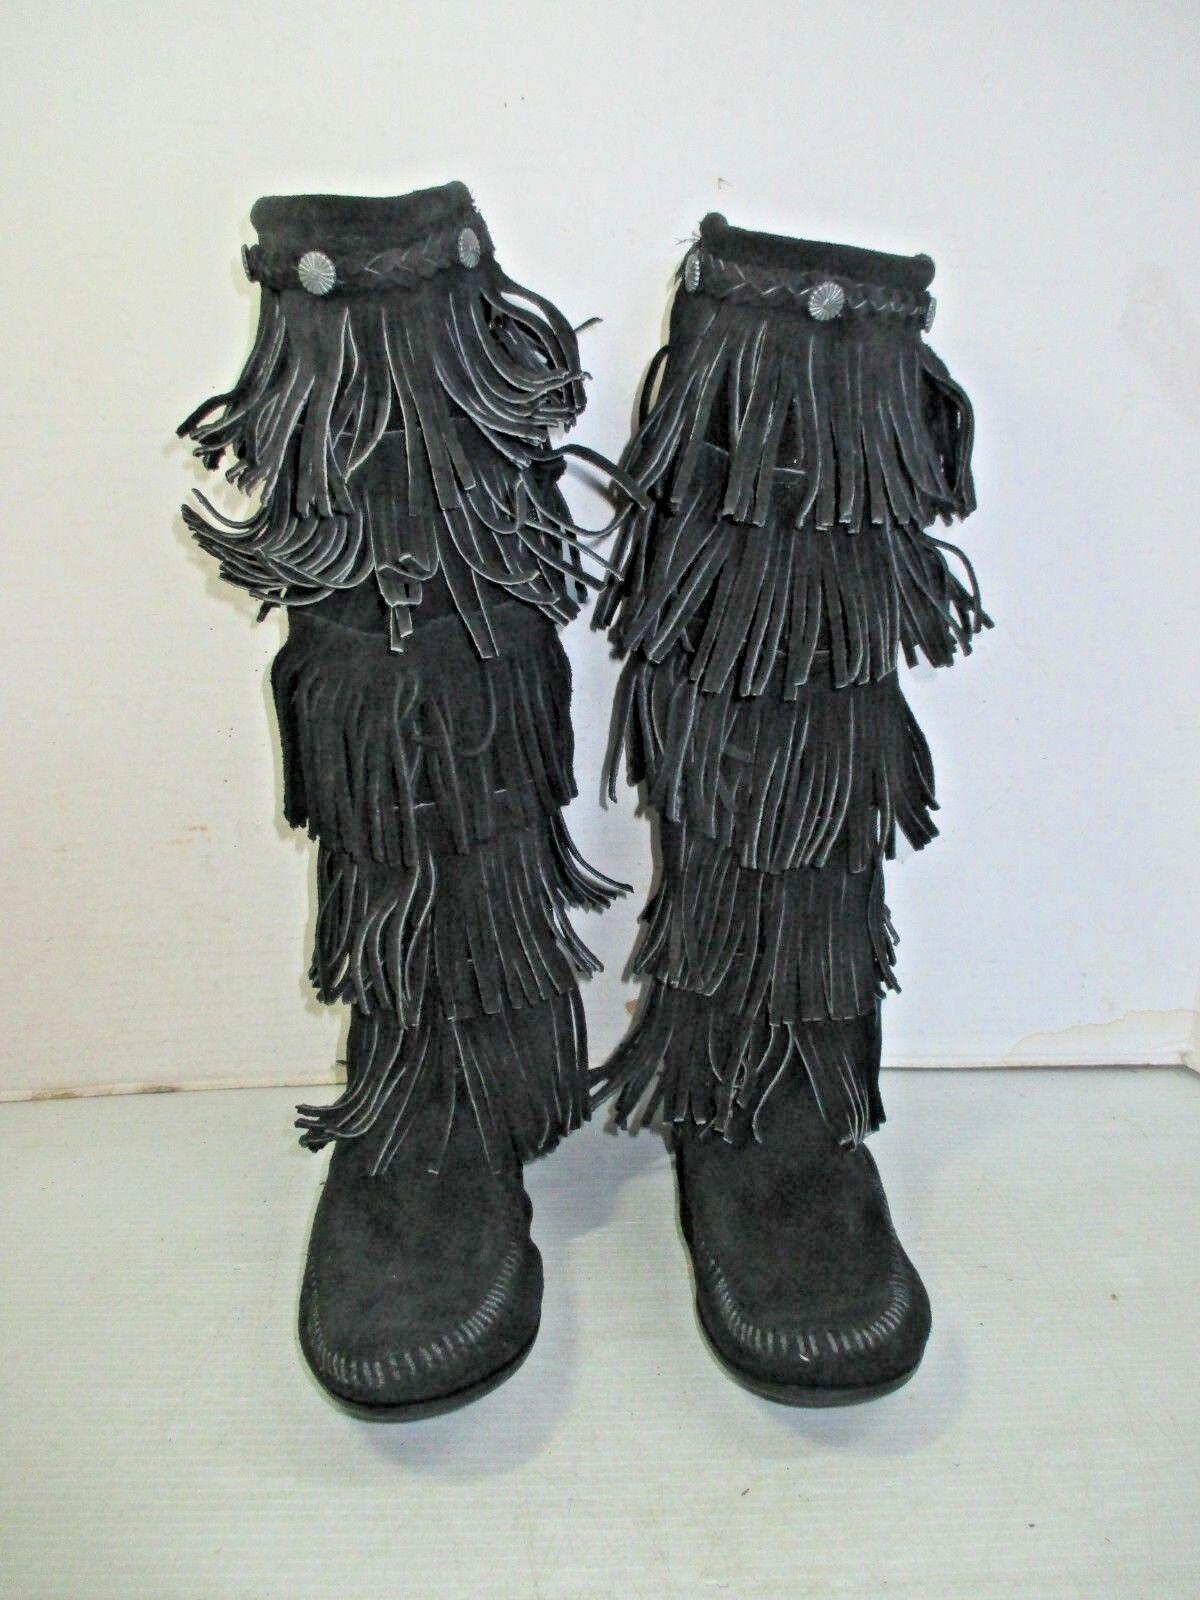 Para mujer botas Minnetonka Minnetonka Minnetonka Moccasin  1659 Negro Flecos de Gamuza 5 niveles con Cremallera Talla 7  100% autentico